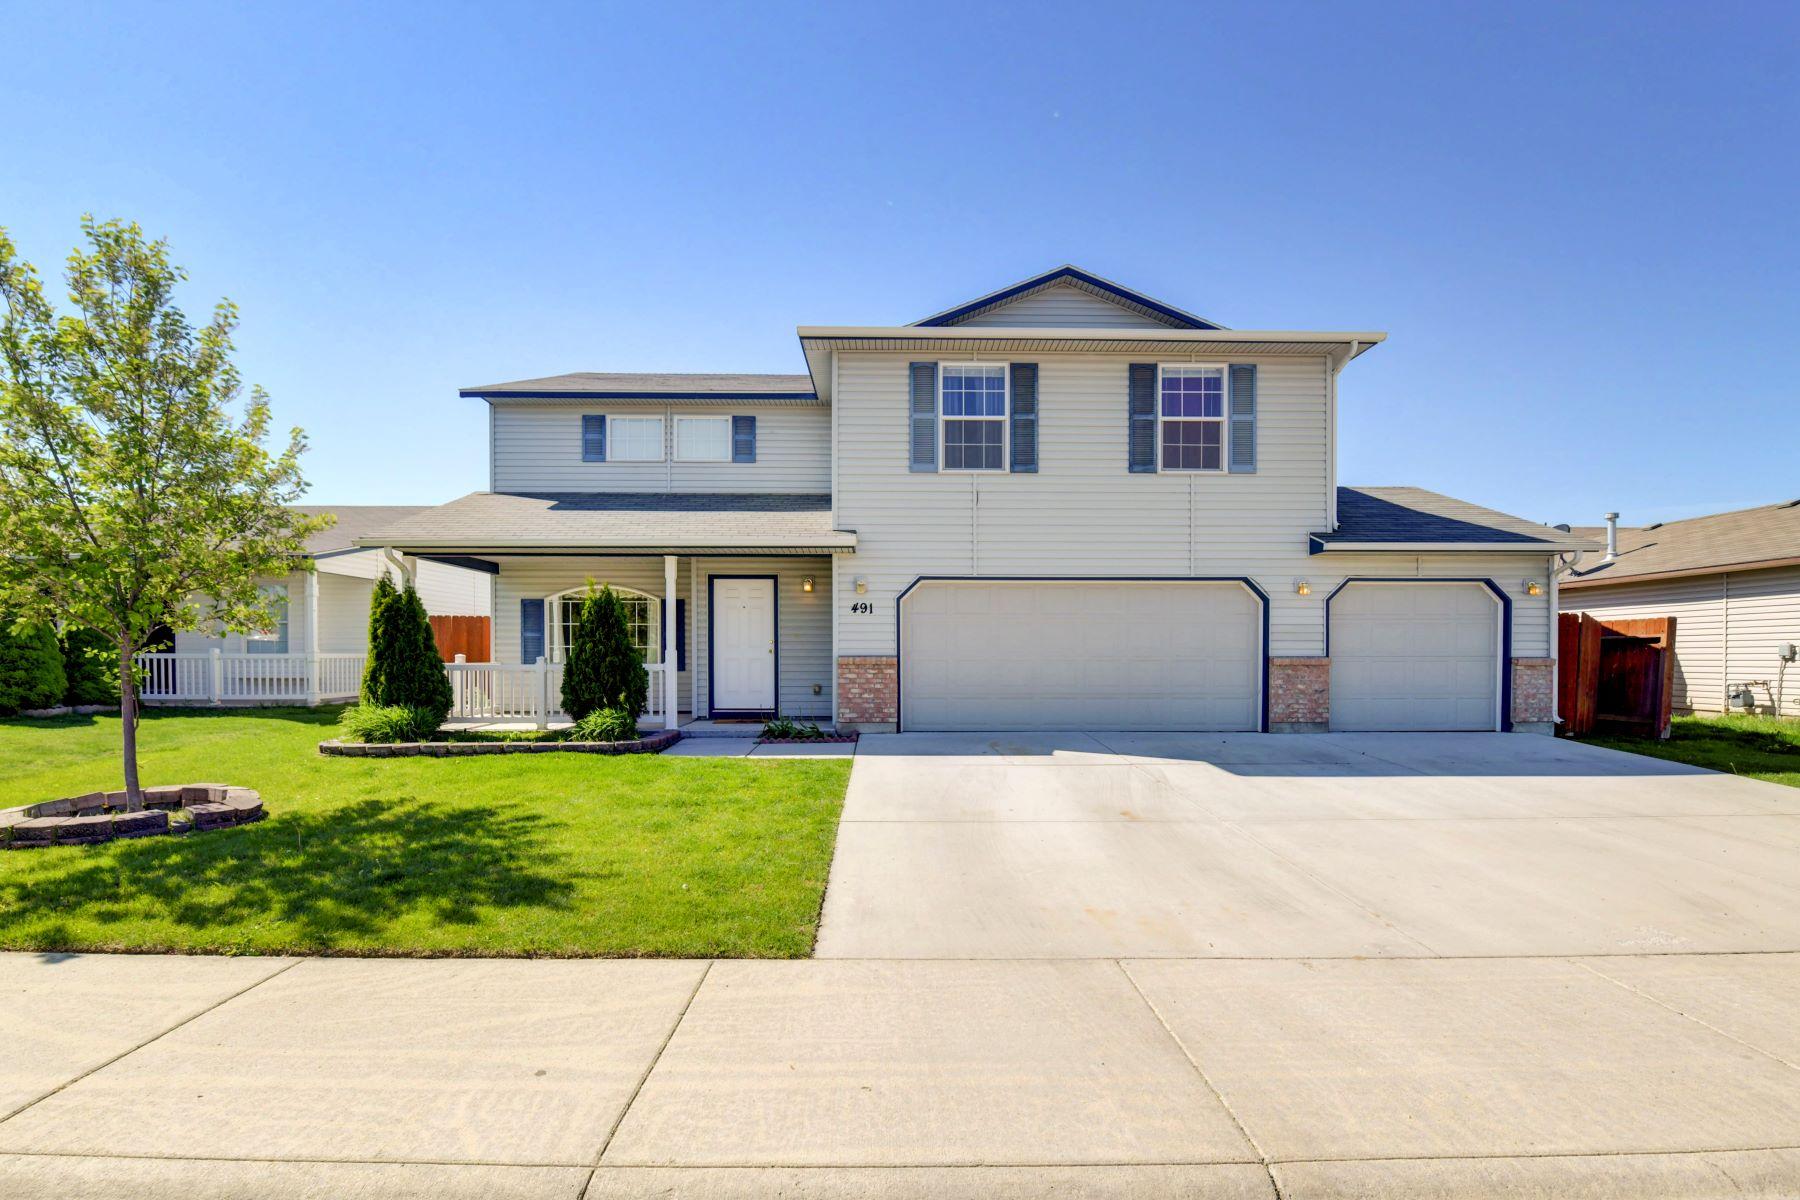 Single Family Home for Active at 491 Black Hawk Ct, Kuna 491 E Black Hawk Ct Kuna, Idaho 83634 United States